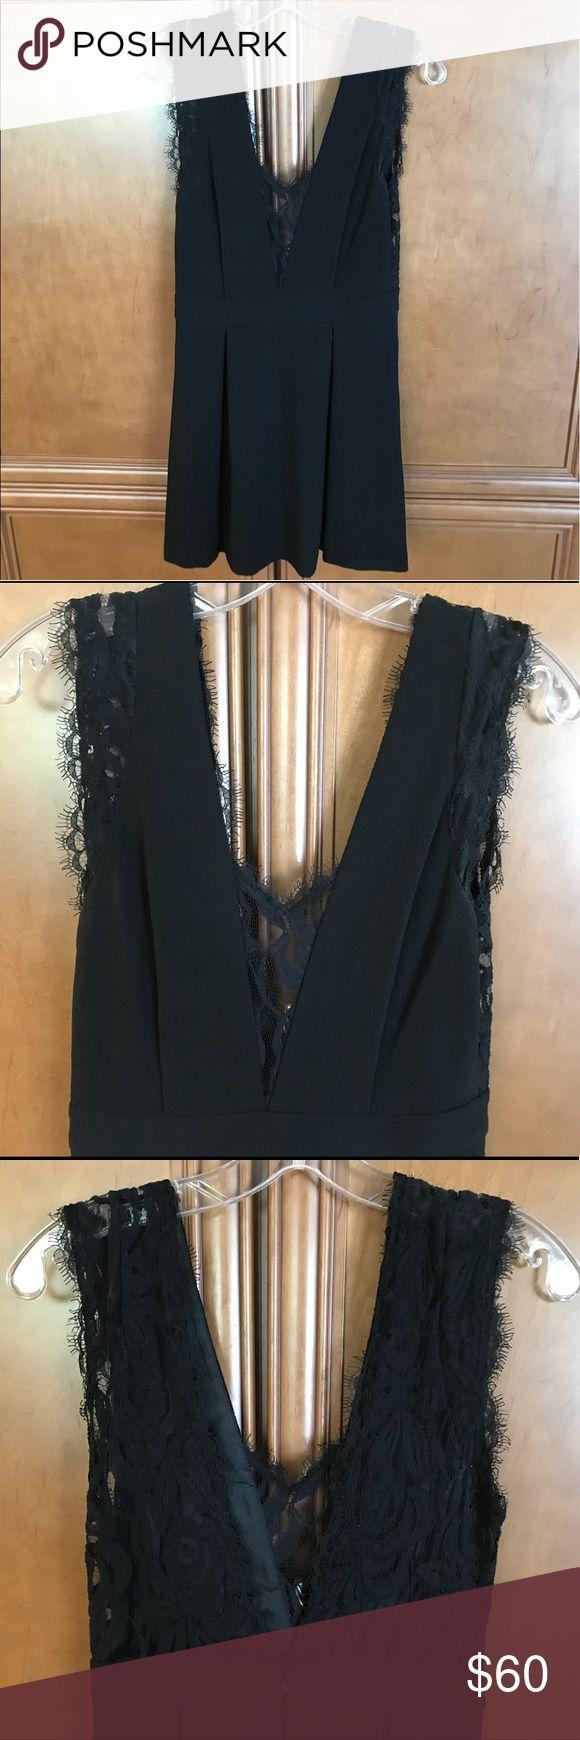 BCBG Generation Mini Black Lace Dress (Size 6) BCBG Generation Mini Black Lace Dress (Size 6). The perfect Little Black Dress!!!! Perfect Condition!!!! Only Worn Once! BCBGeneration Dresses Mini